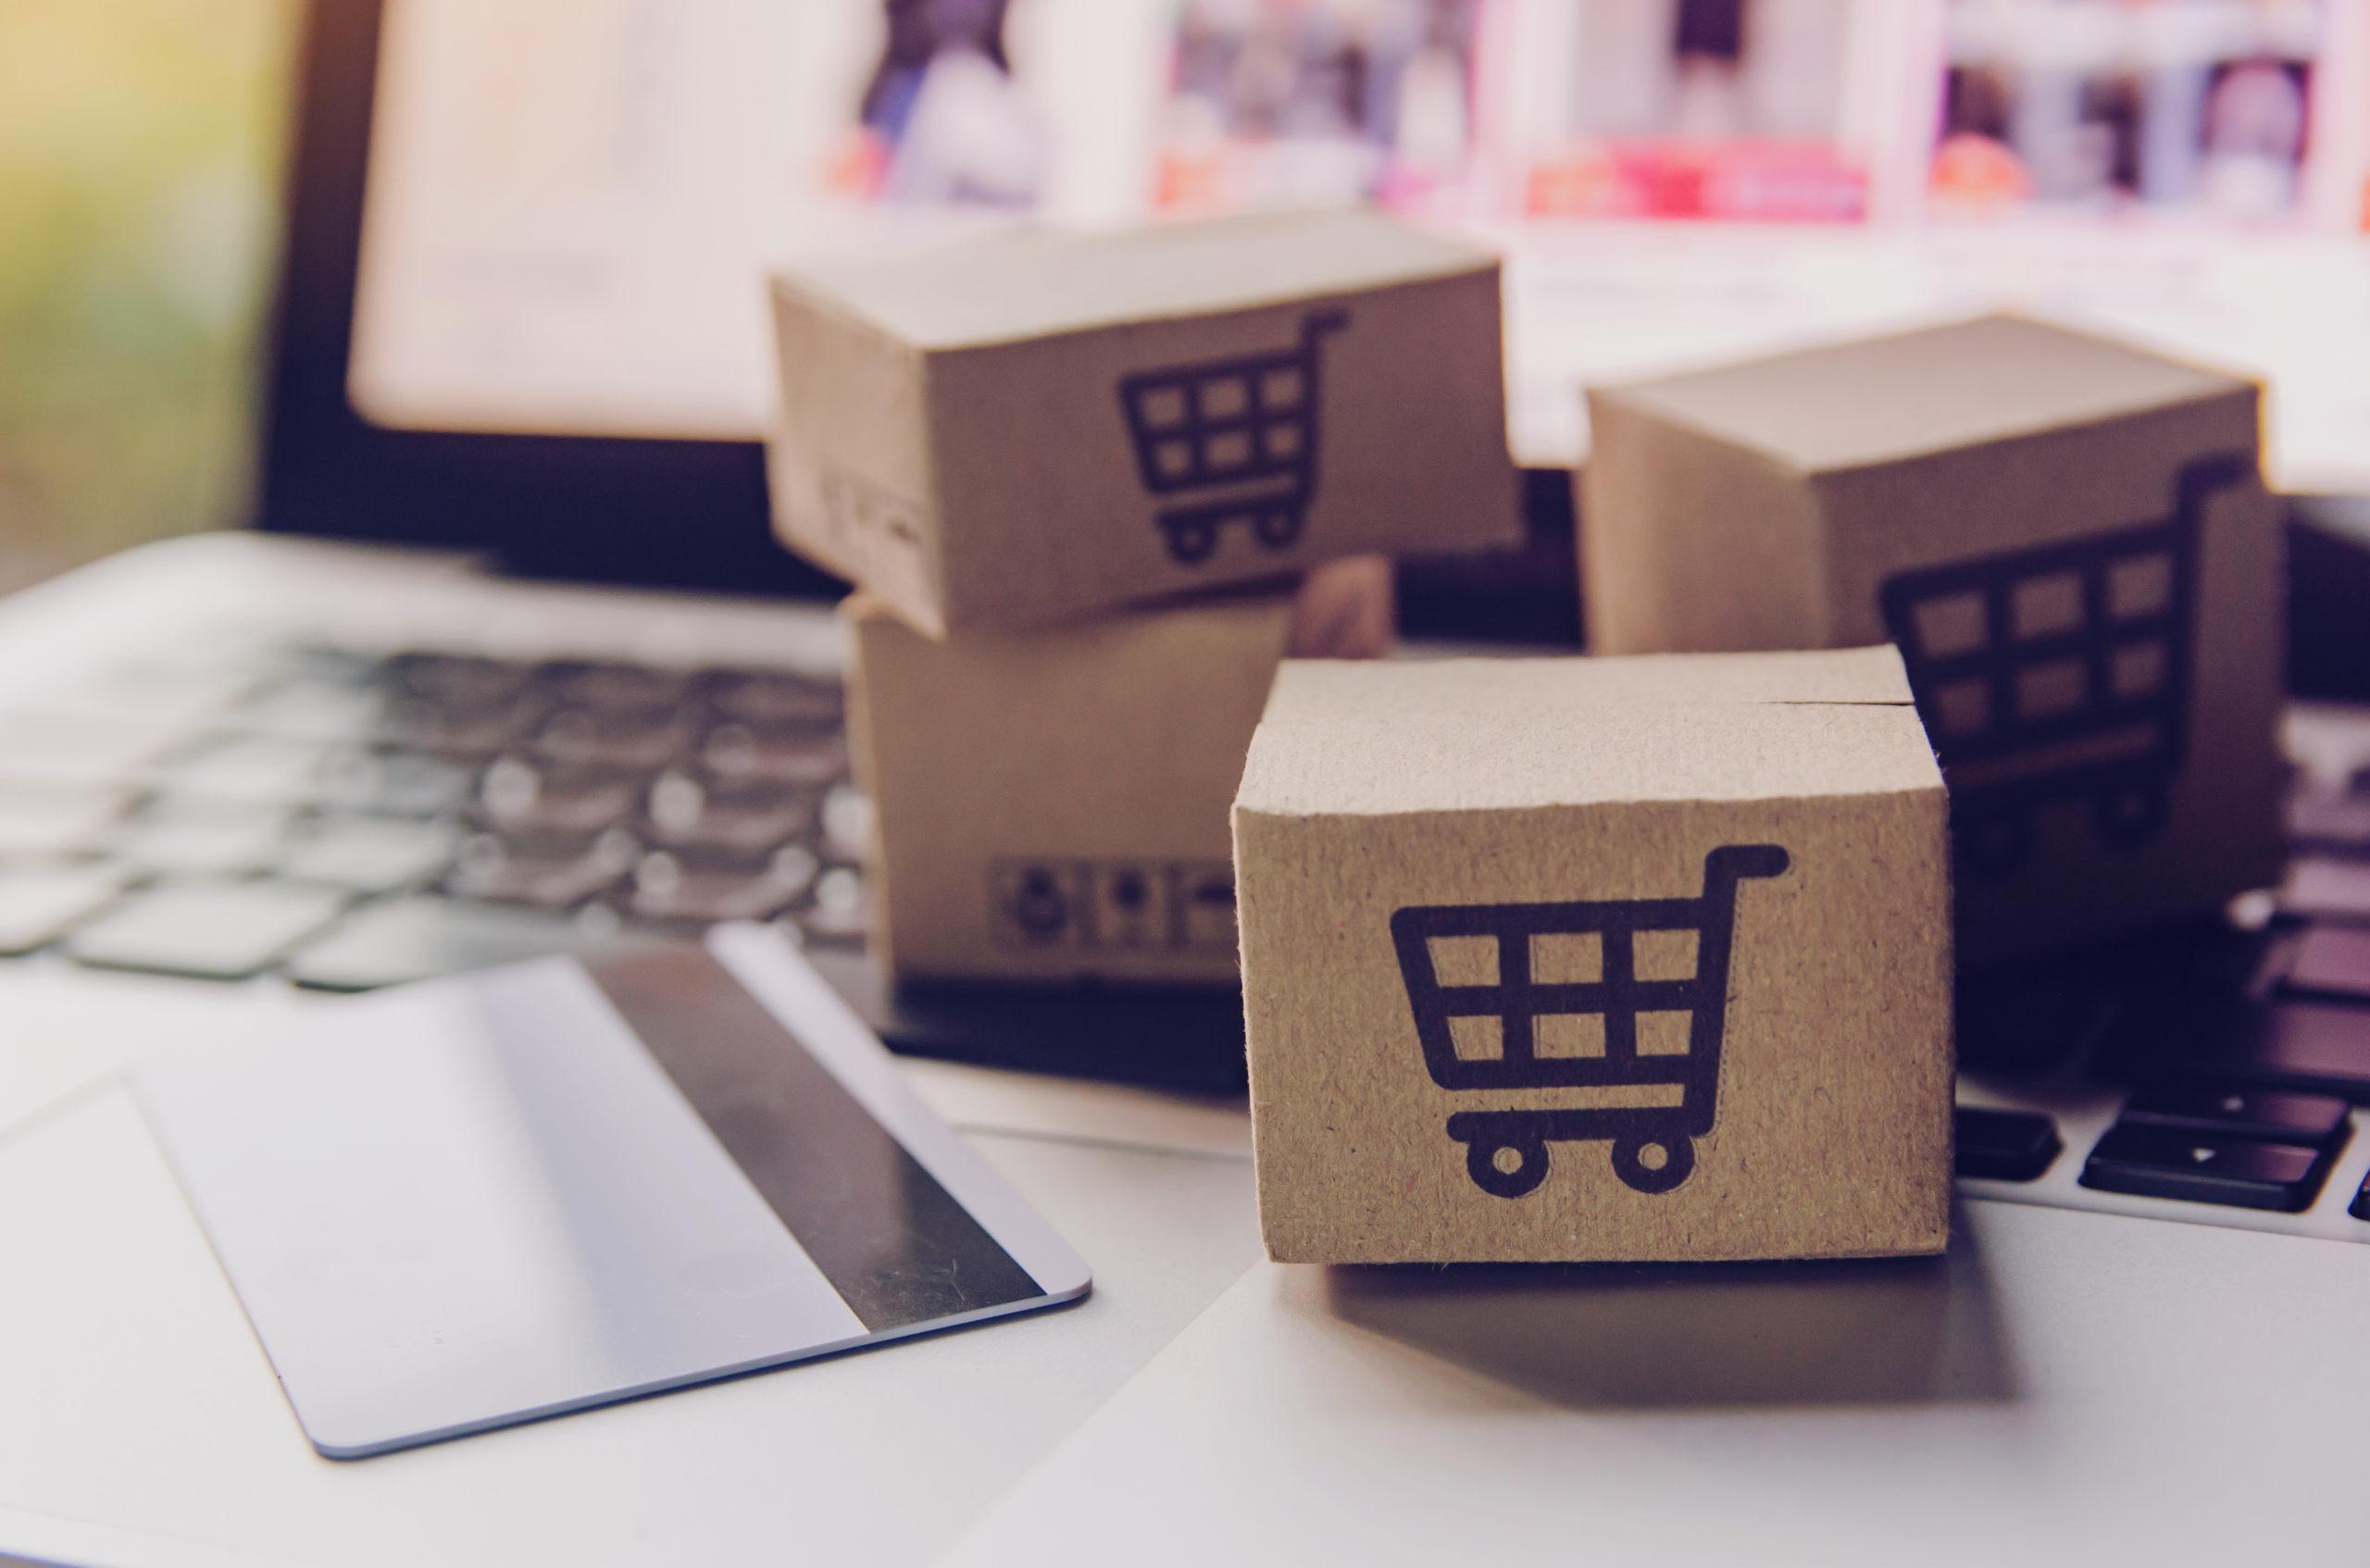 Amazon, Mercado Libre y Rappi crecen 52% en América Latina: Google